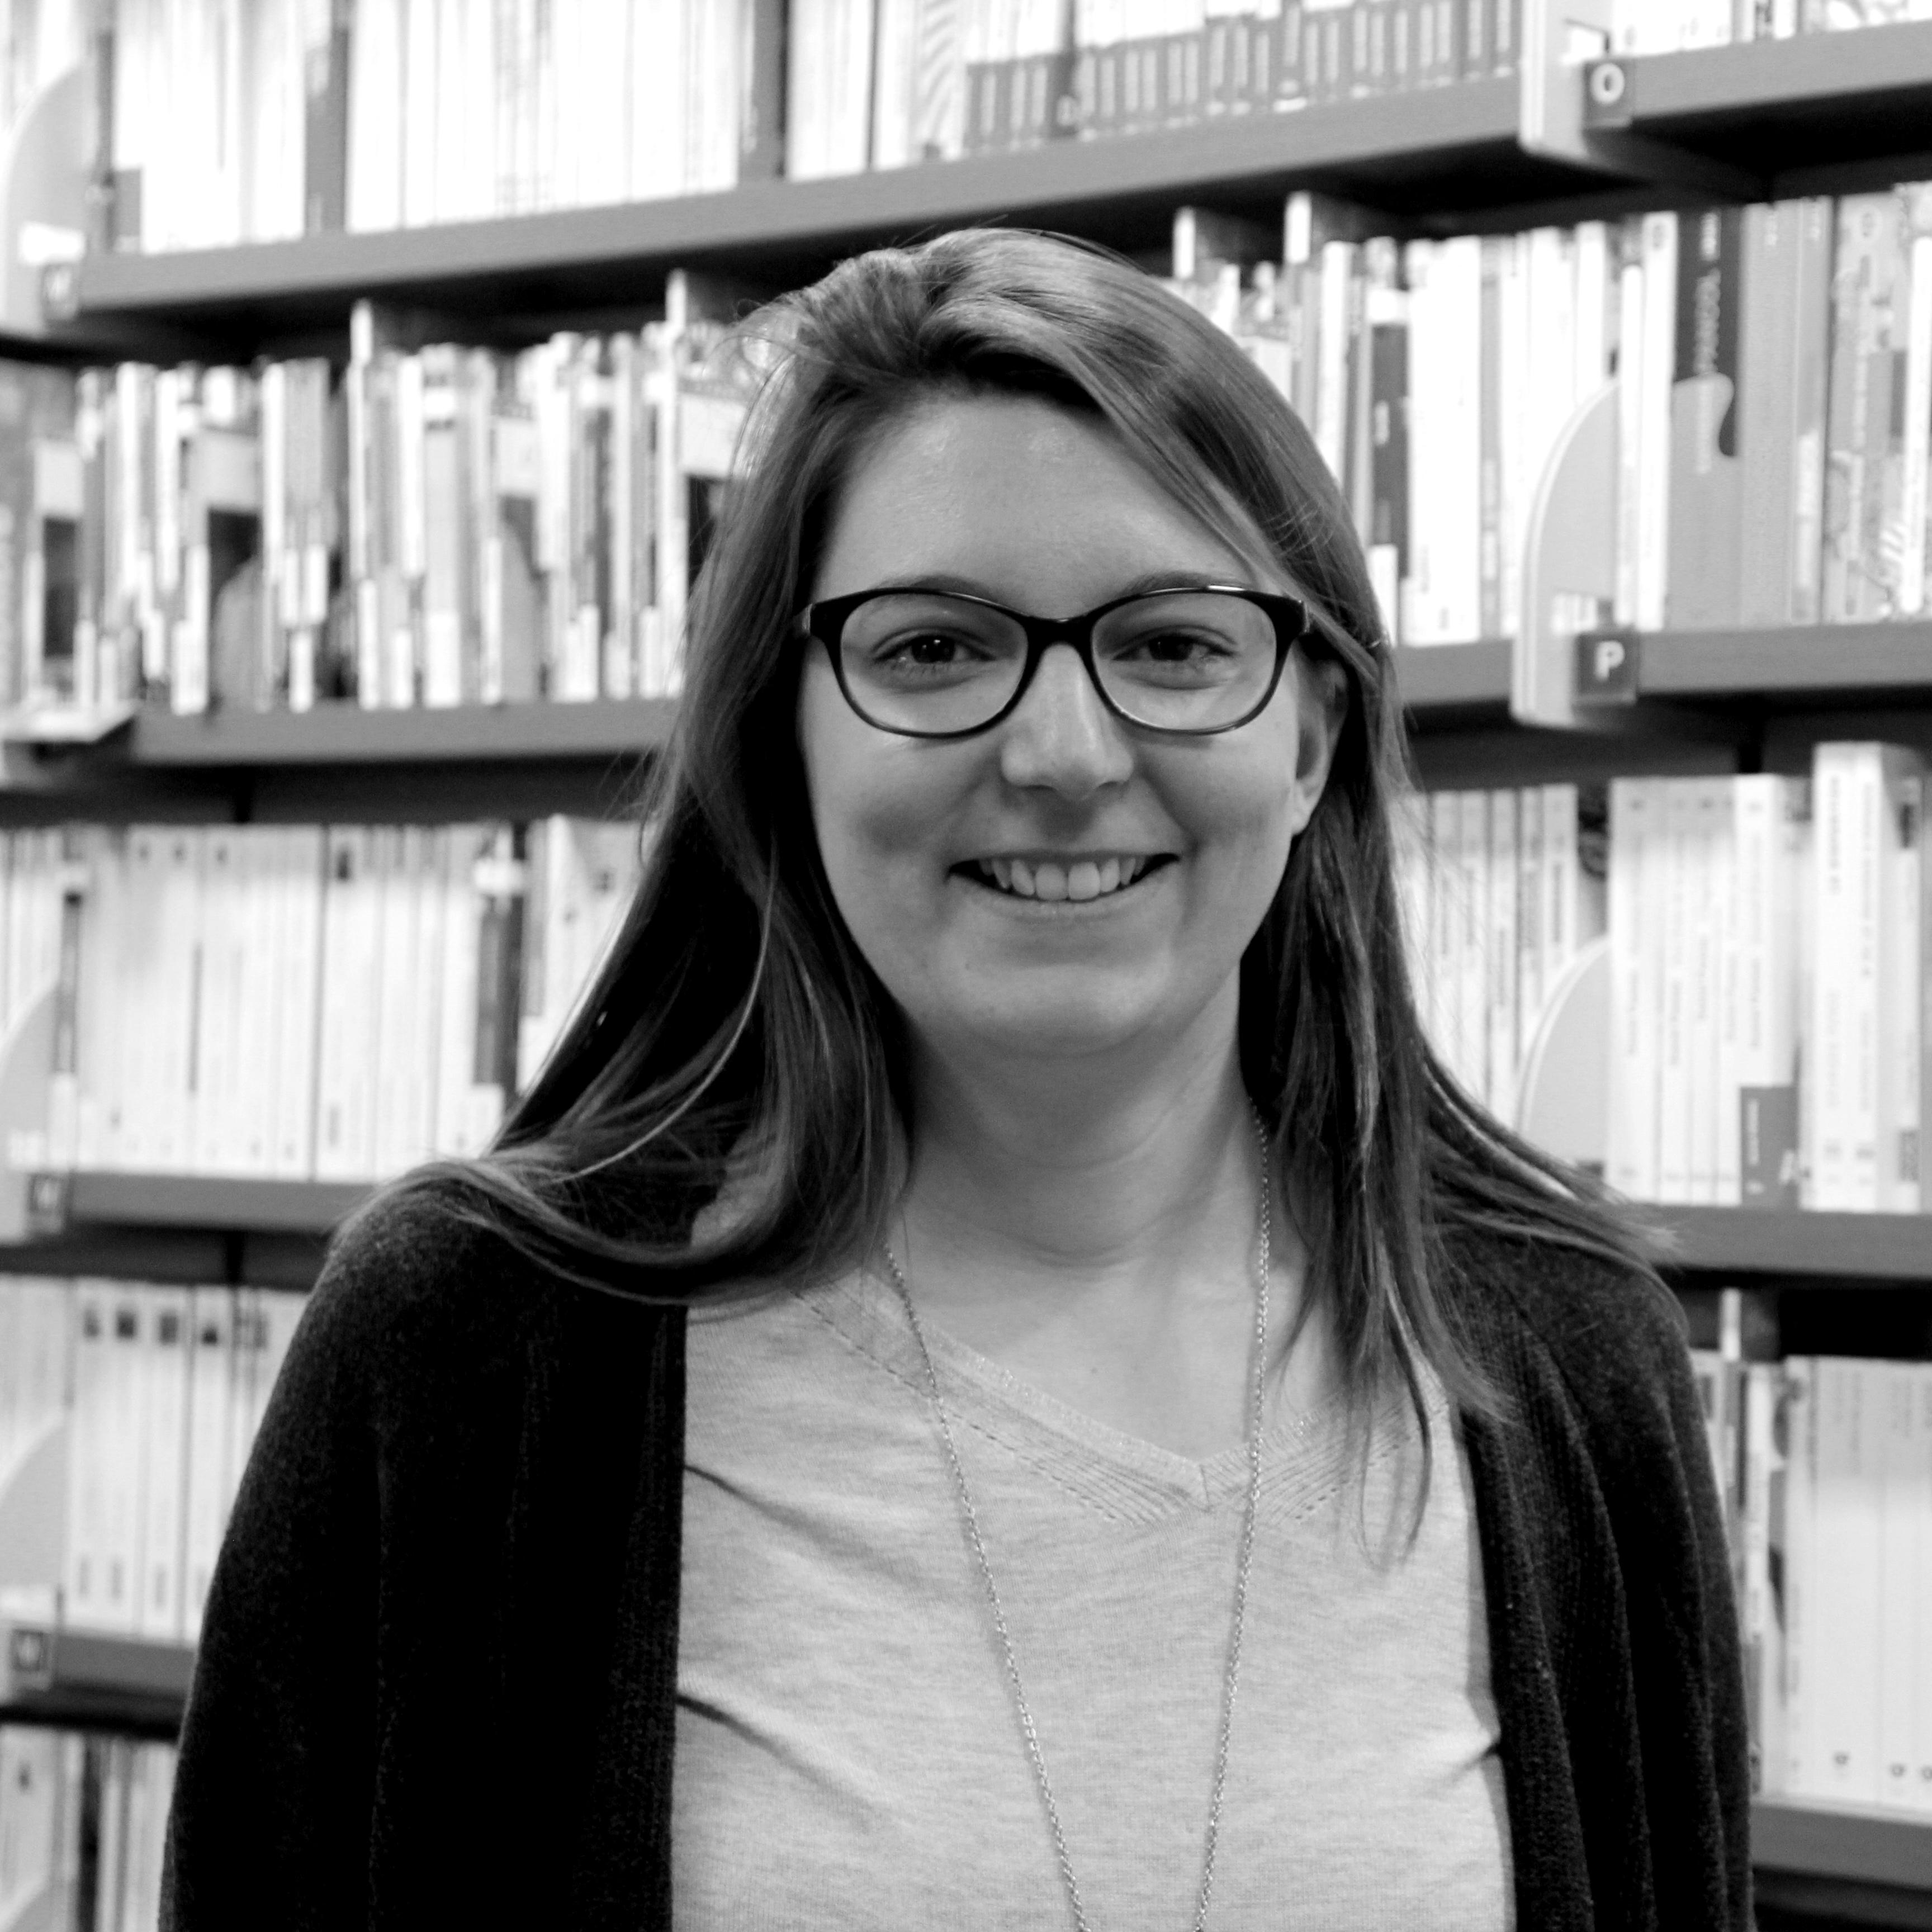 Alexandra, Librairie de Paris